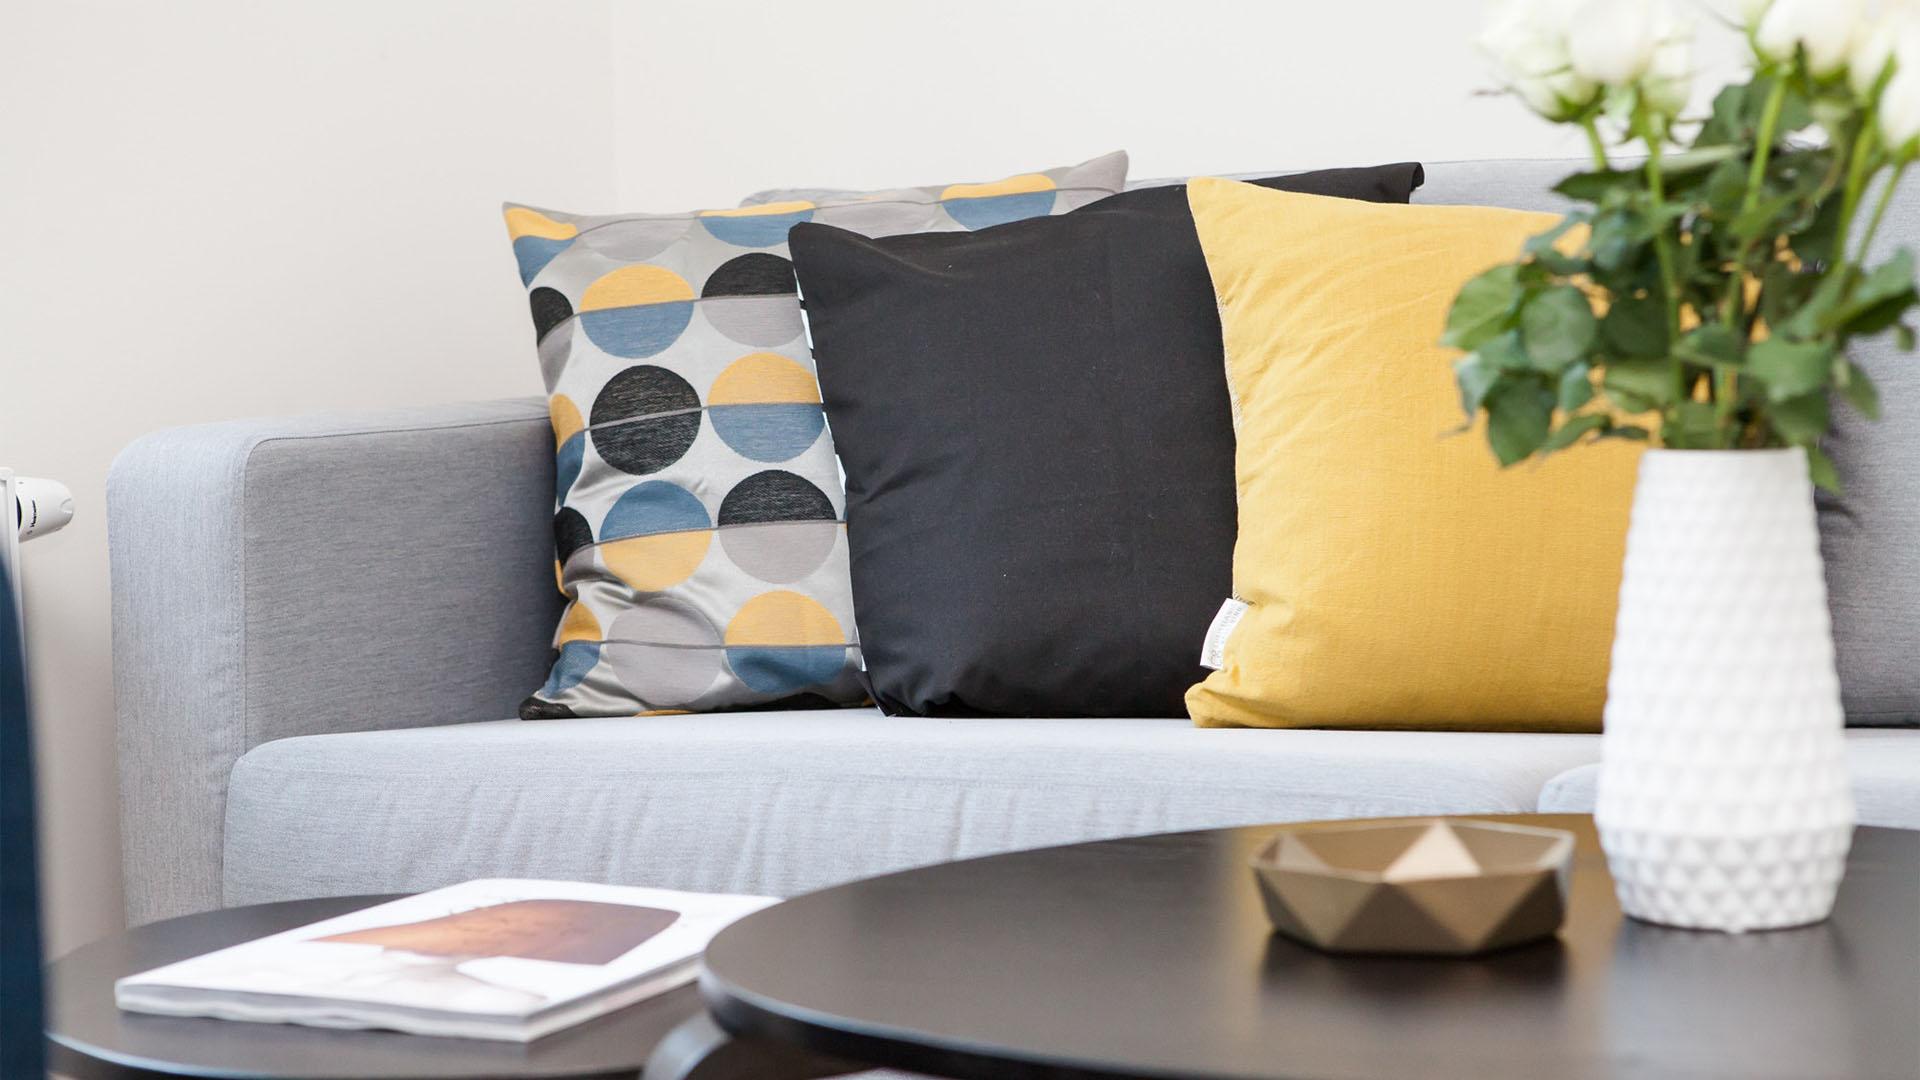 Sensational Is It Cheaper To Ship Furniture Or Buy New When Relocating Interior Design Ideas Tzicisoteloinfo